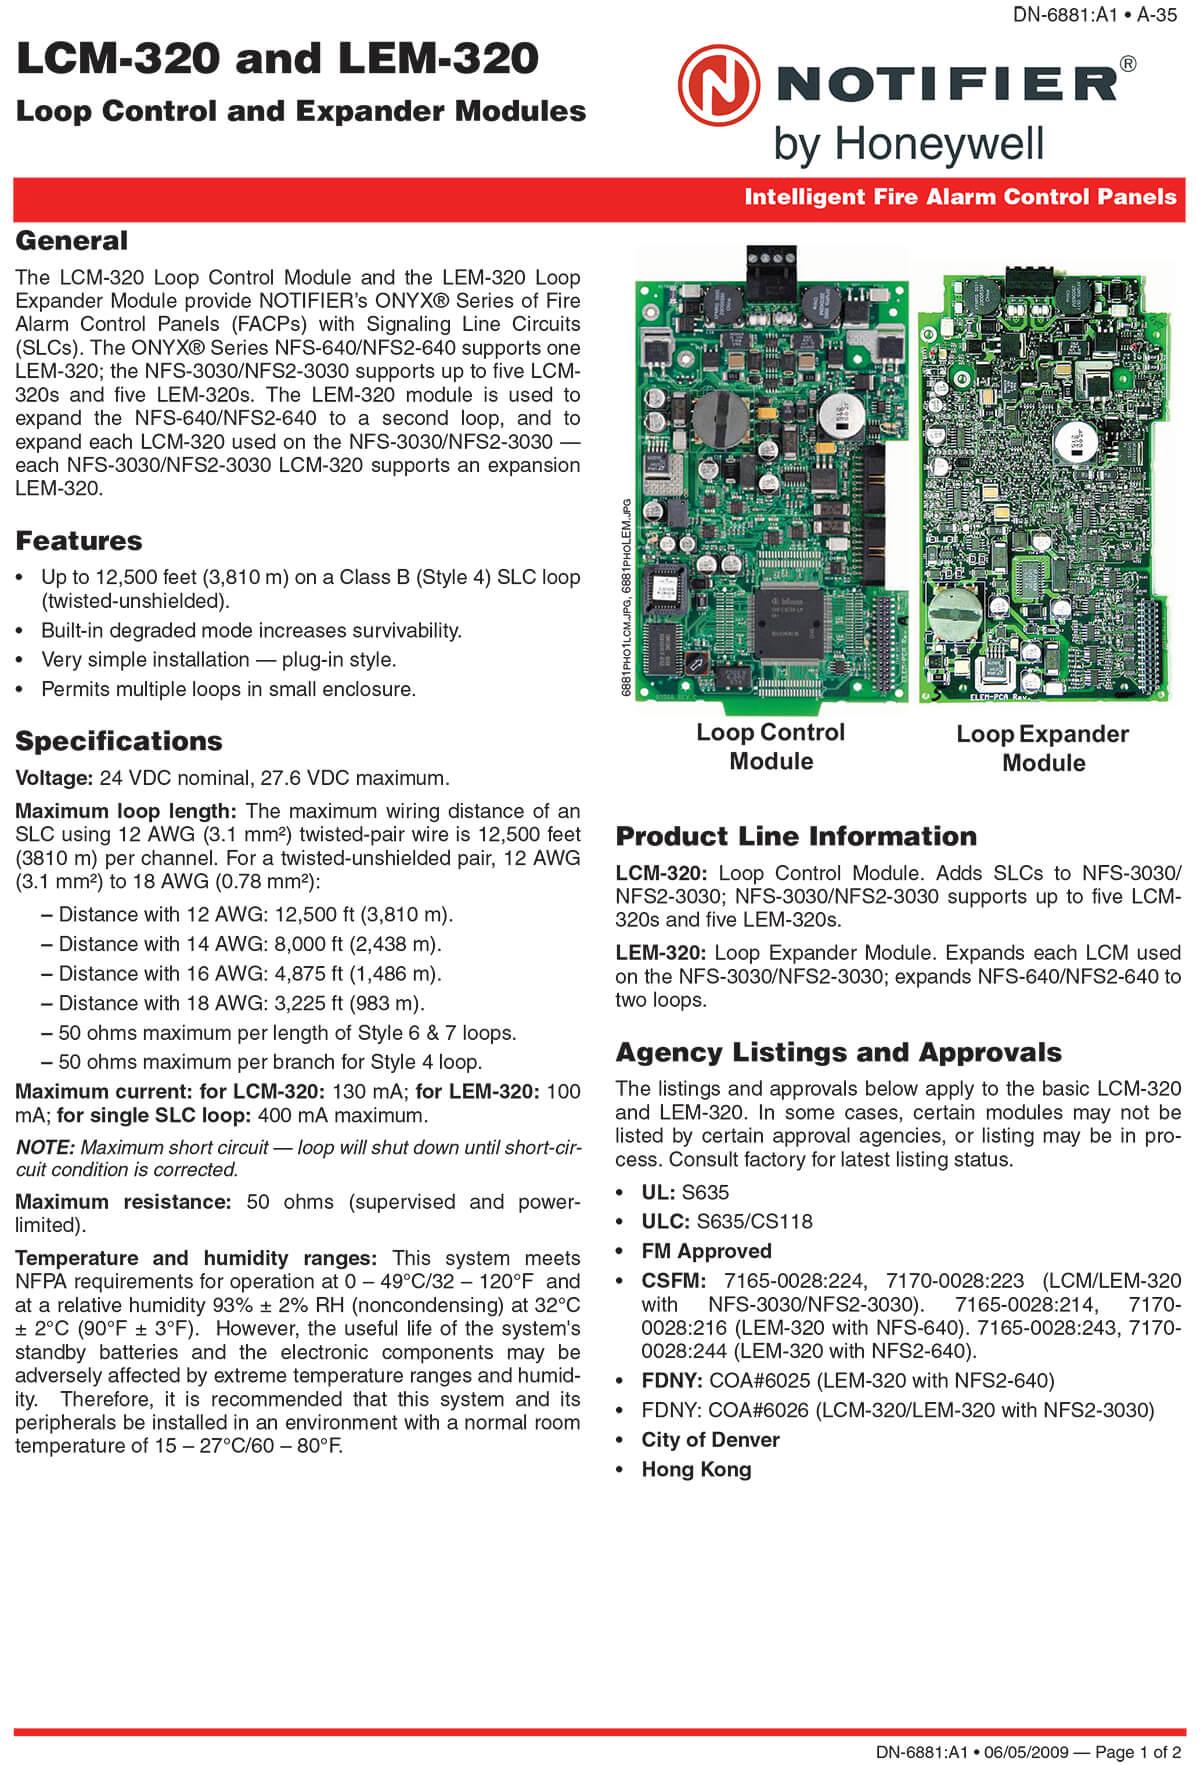 LCM & LEM Loop Control and Expander Modules